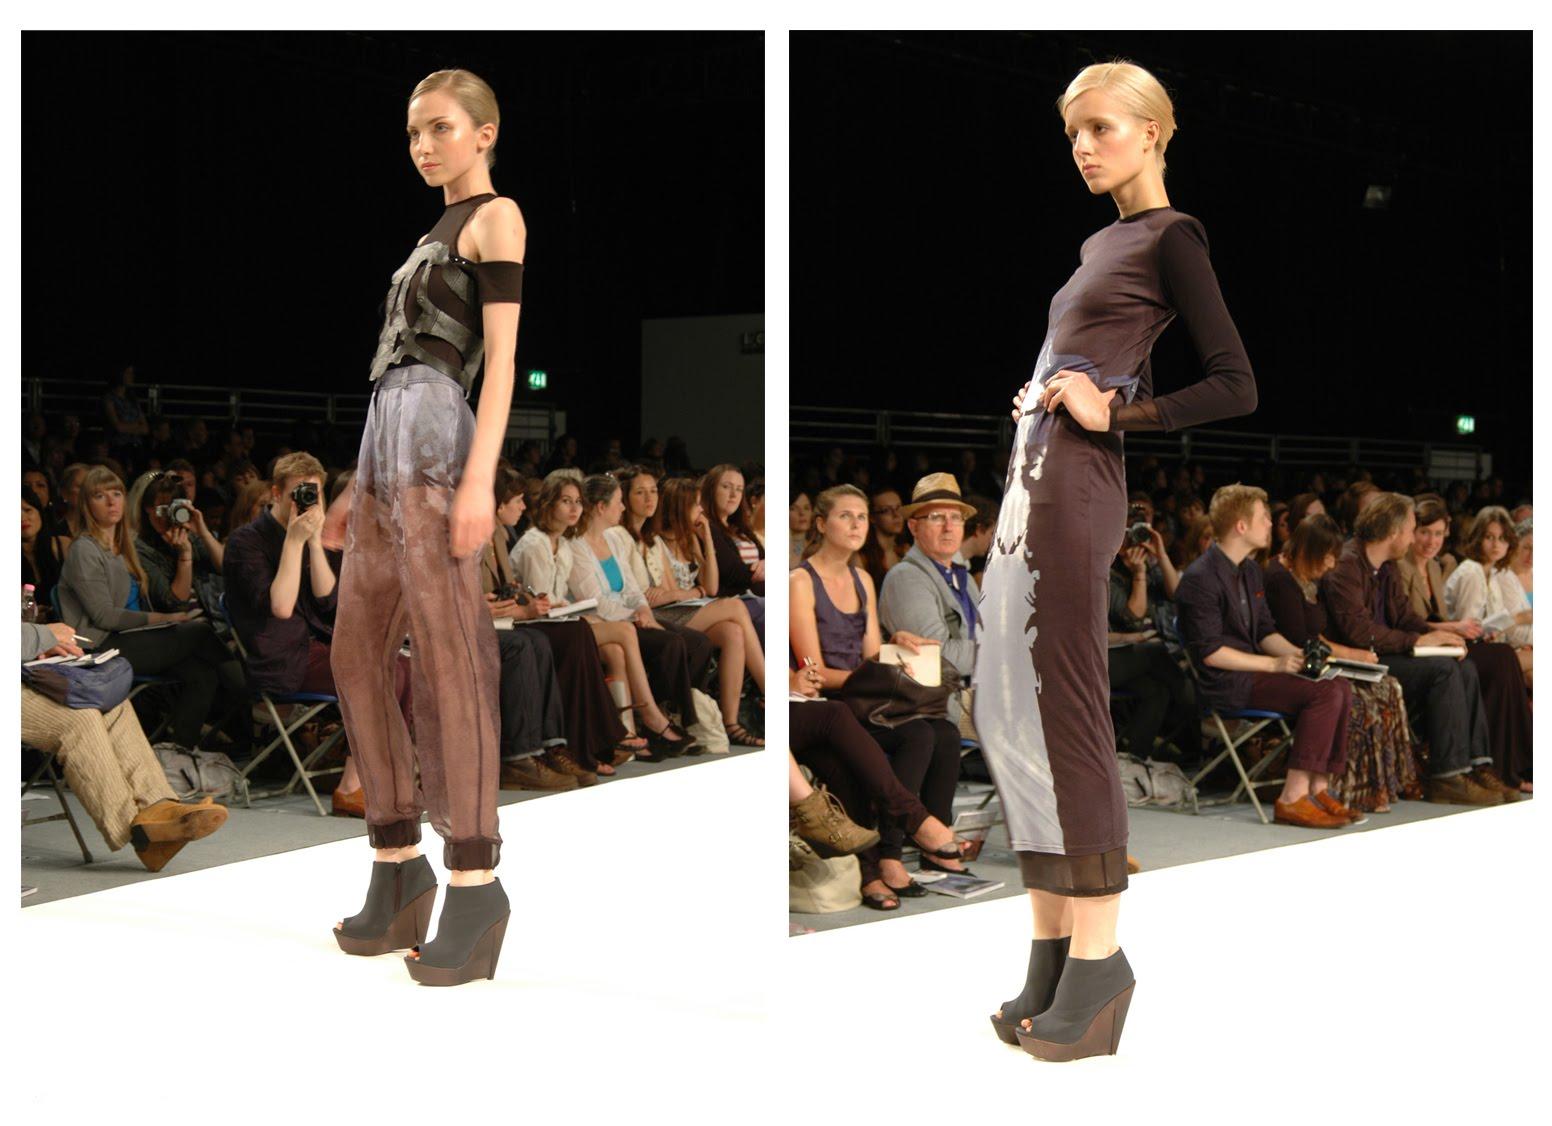 Graduate Fashion Week London 2010 Carly Njini From University Of East London Fashion Foie Gras